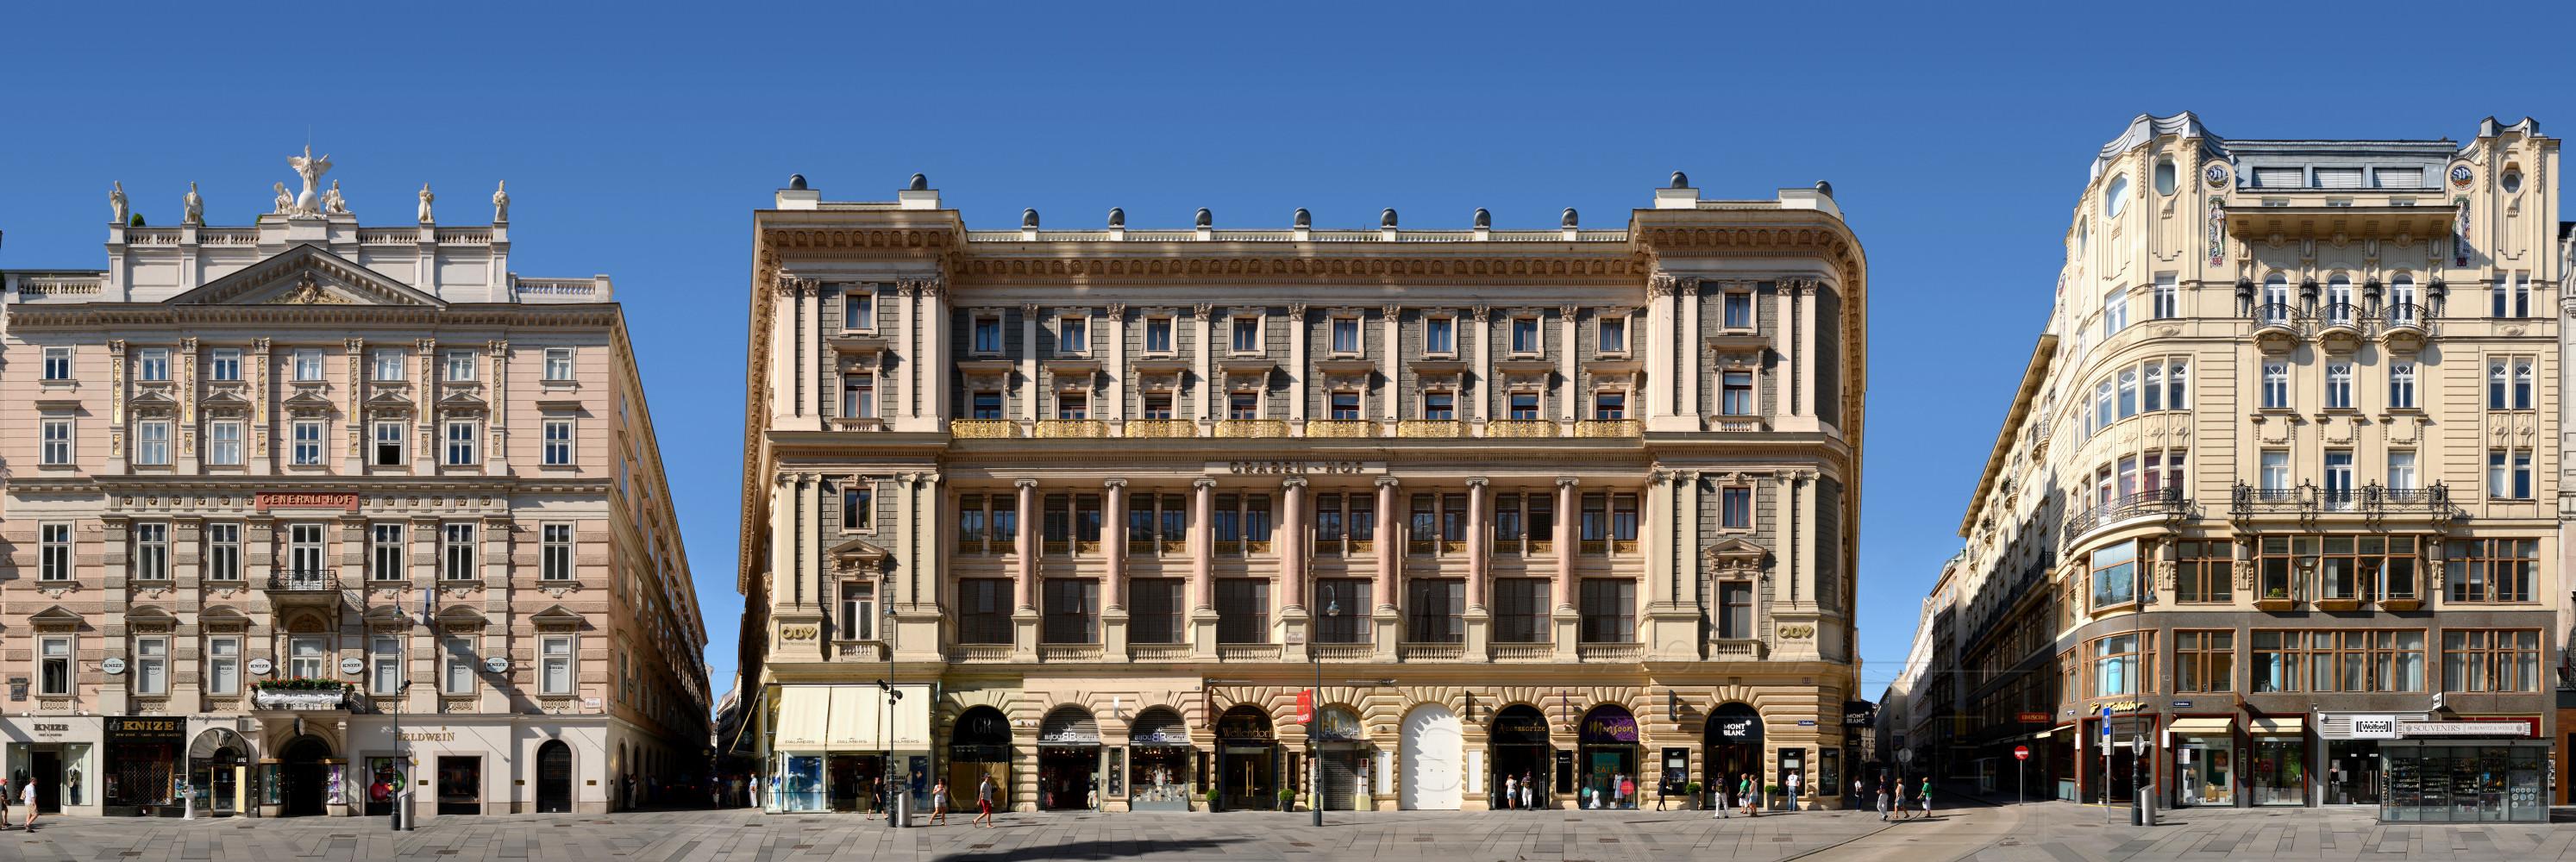 Wien Architektur Foto Fotografie Fassaden